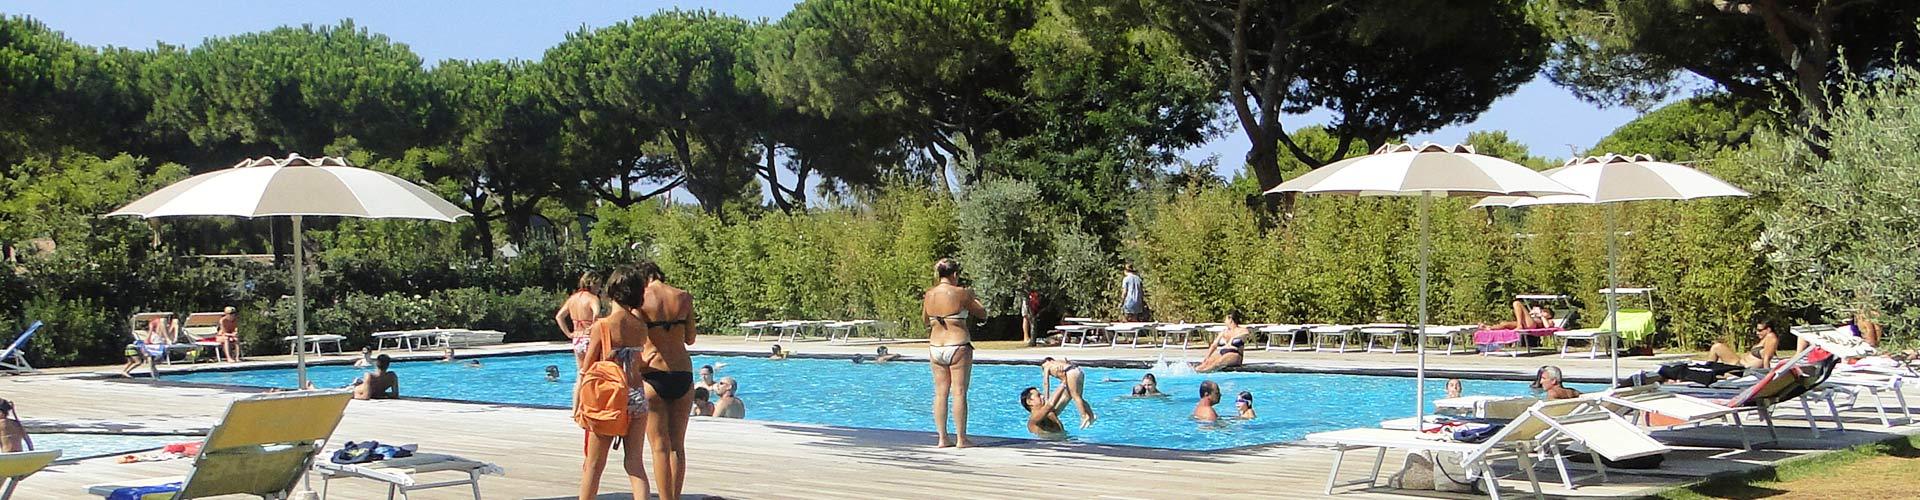 campingplatz toskana orbetello camping am meer in italien. Black Bedroom Furniture Sets. Home Design Ideas